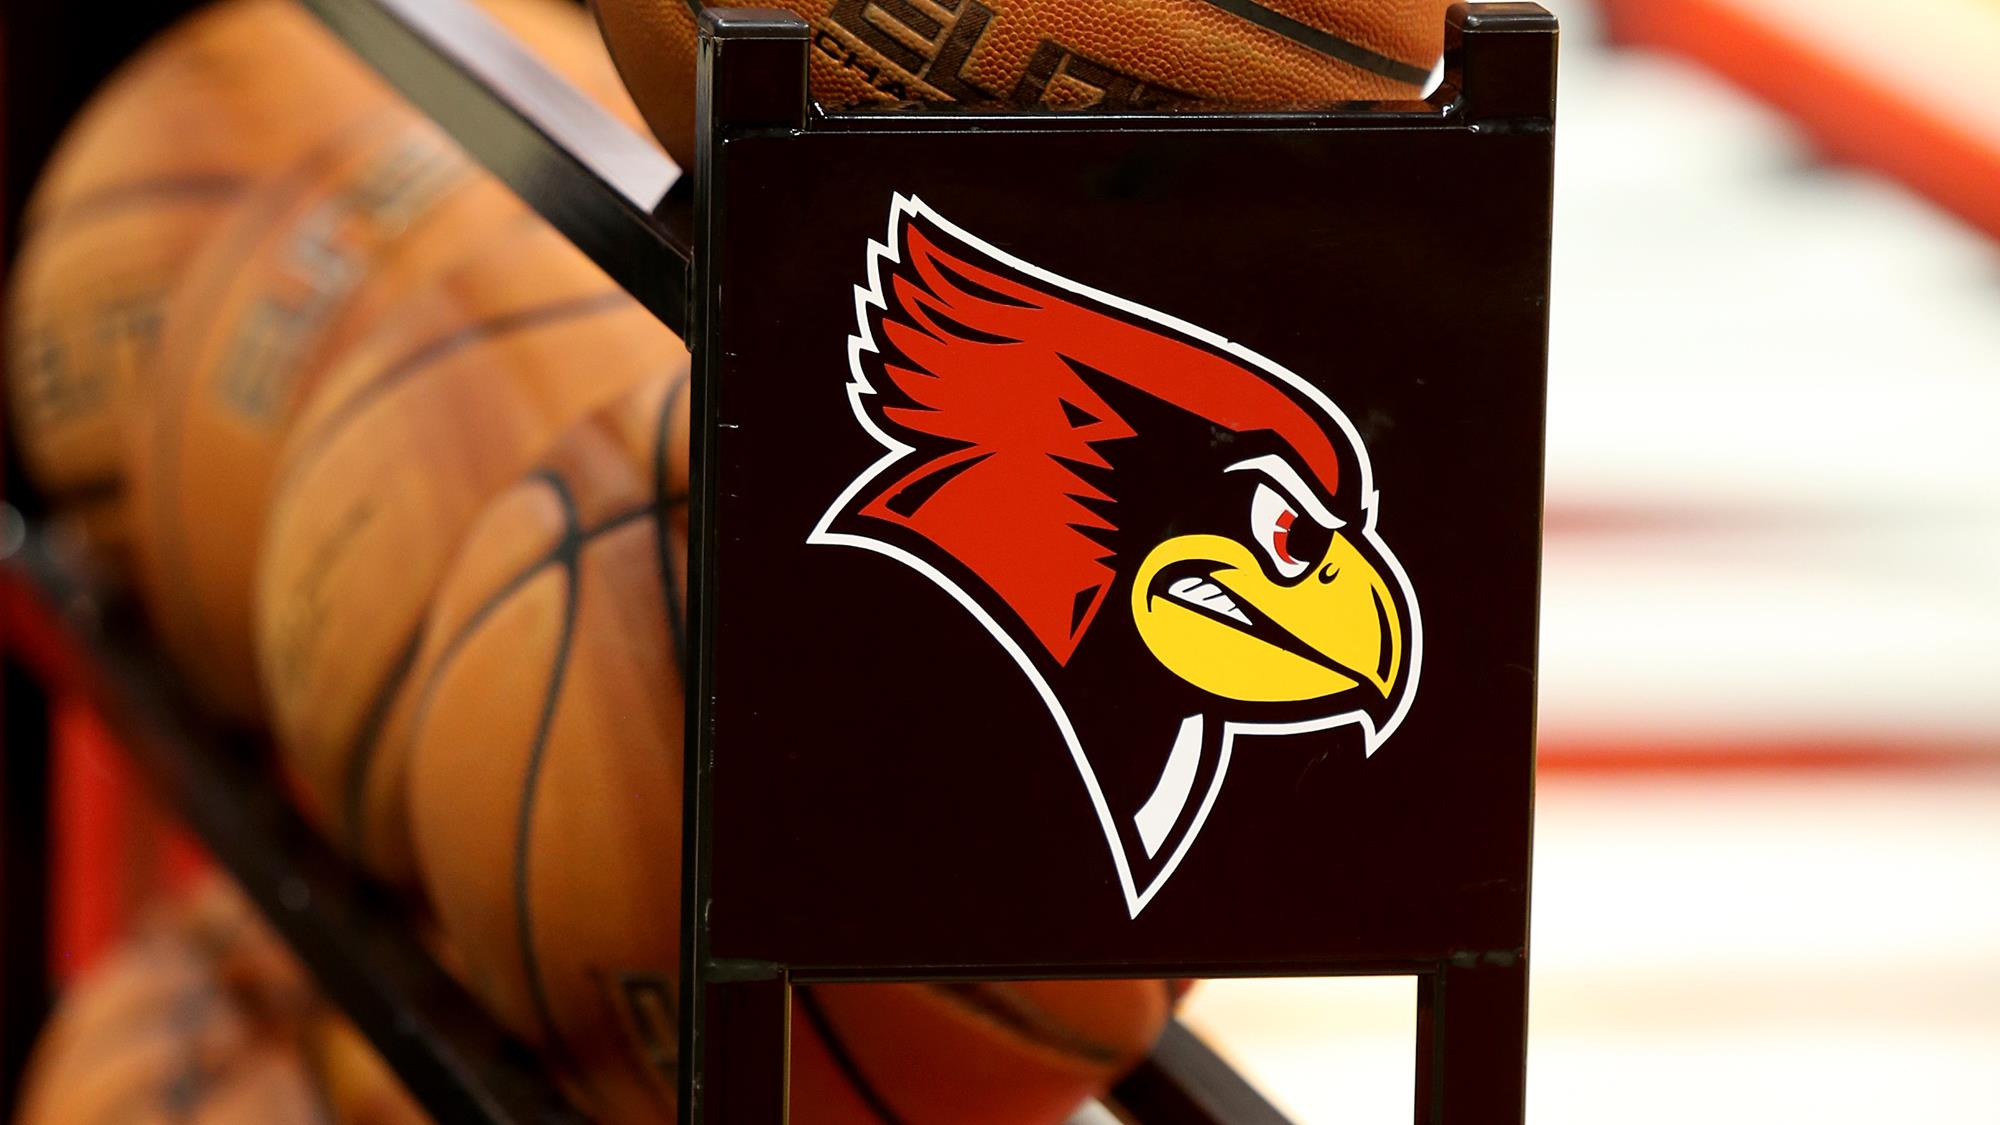 Redbird basketball rack with Redbird logo overlaid